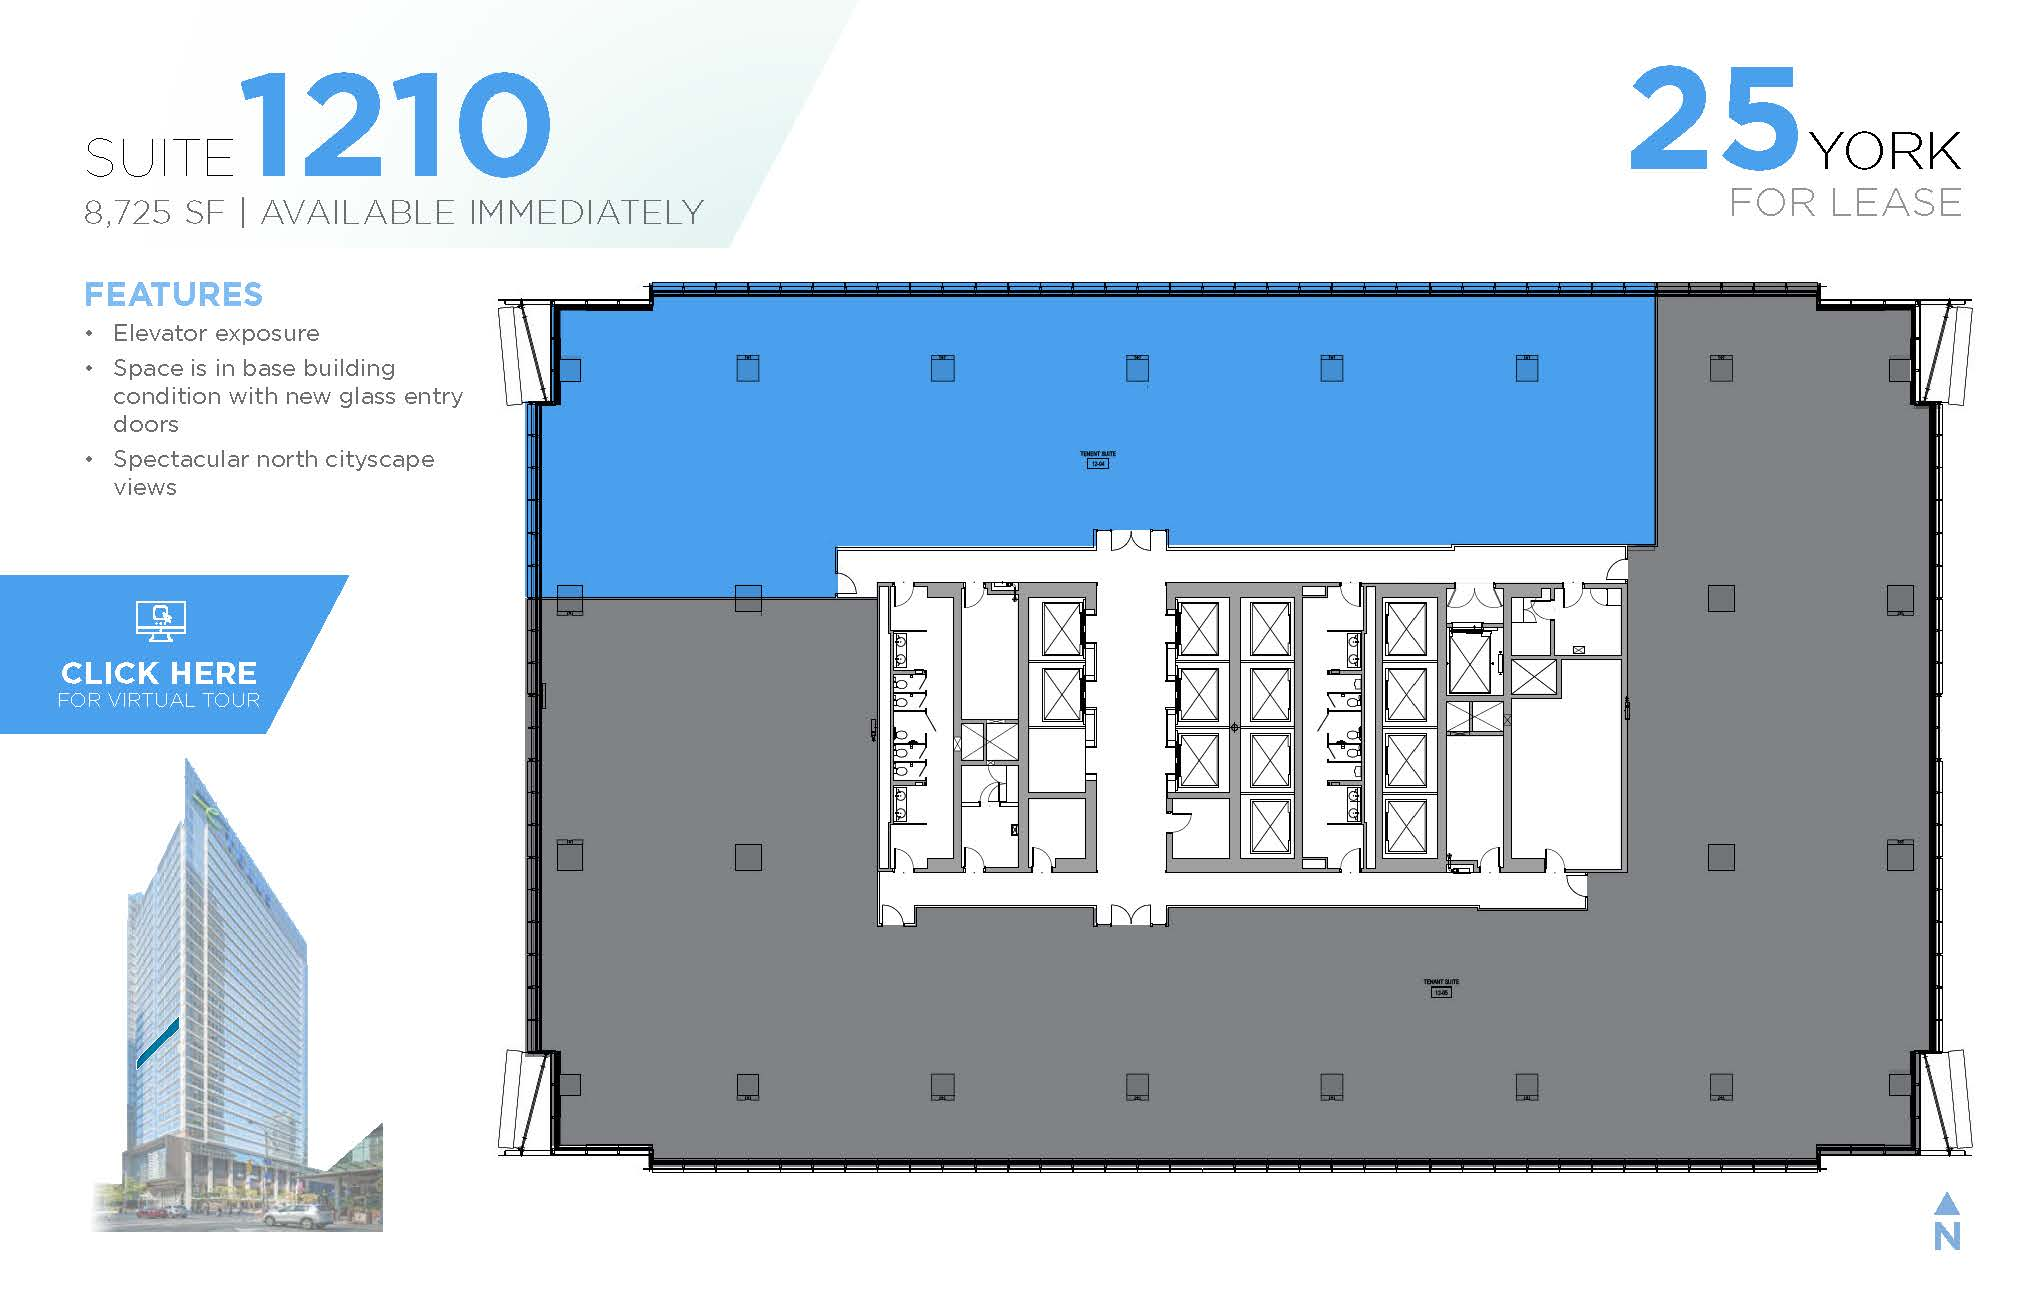 Floorplan thumbnail of Suite 1210